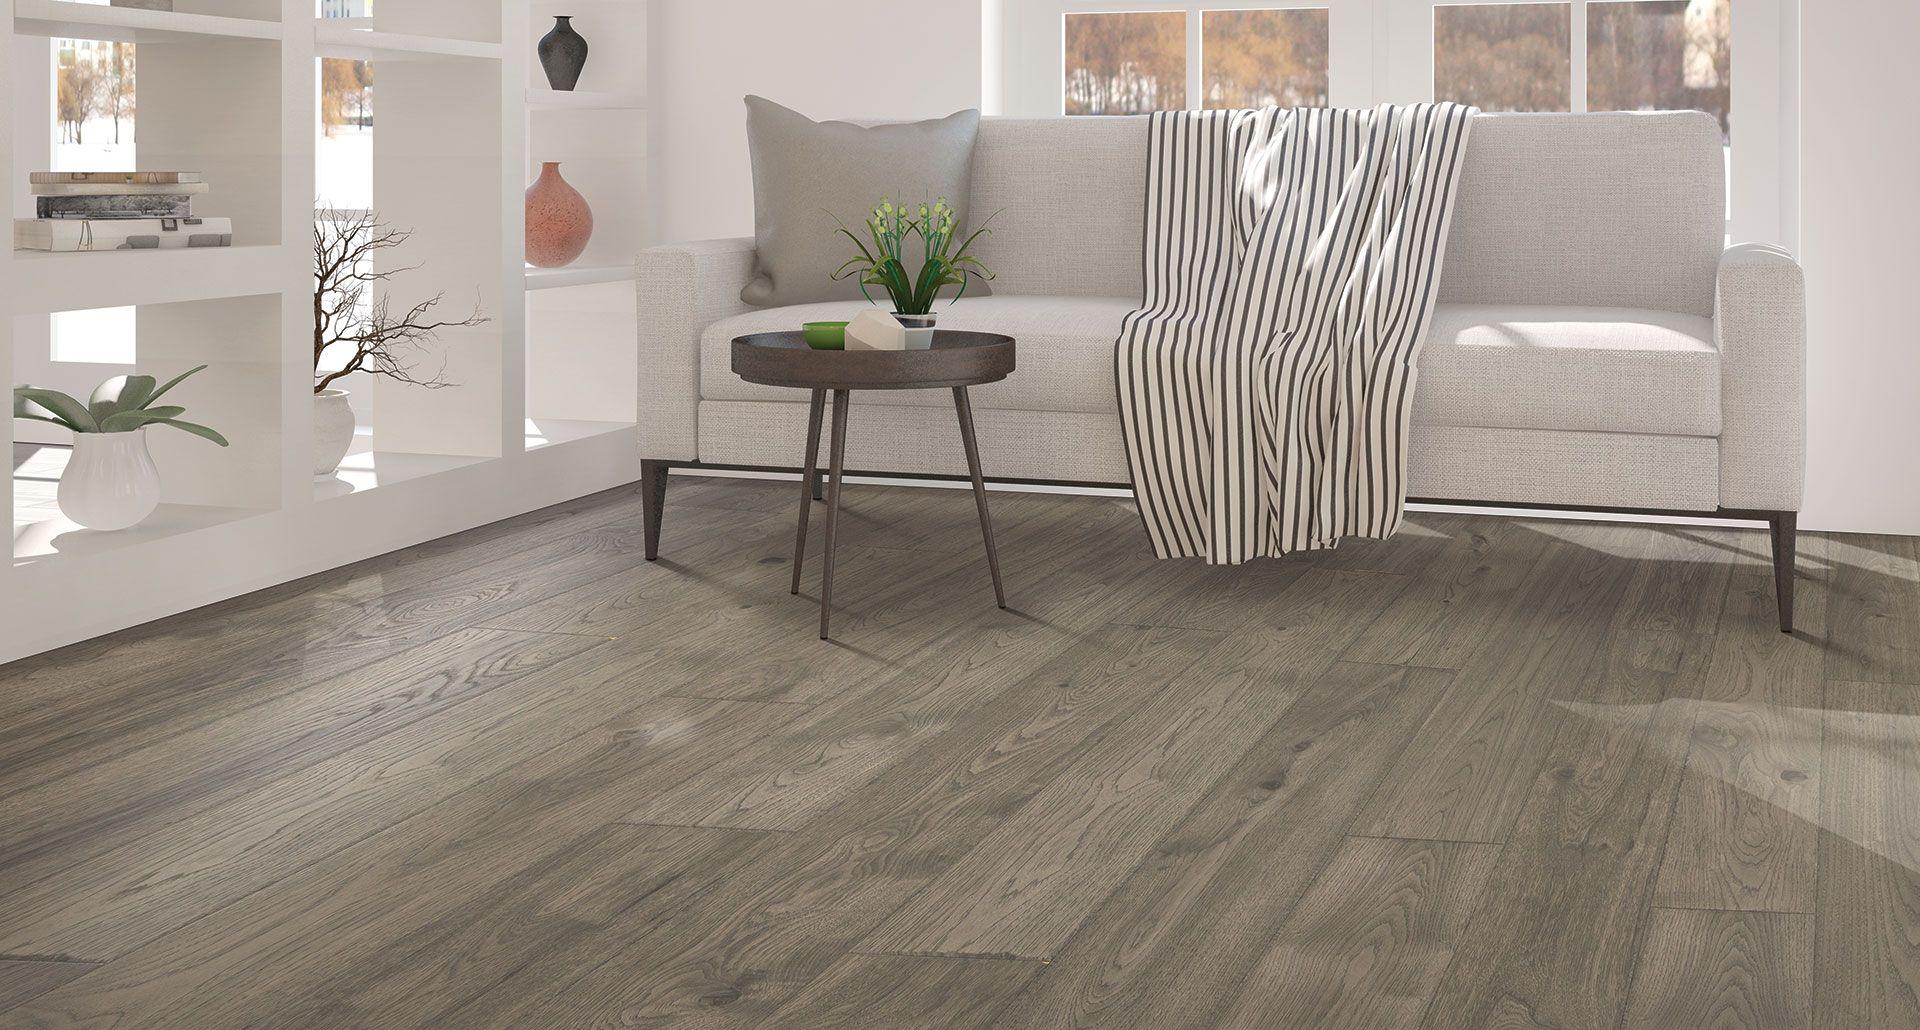 Anchor Grey Oak Laminate Floor Natural Wood Look 12mm Thick 1 Strip Plank Laminate Flooring Lifeti Laminate Flooring Colors Oak Laminate Flooring Flooring